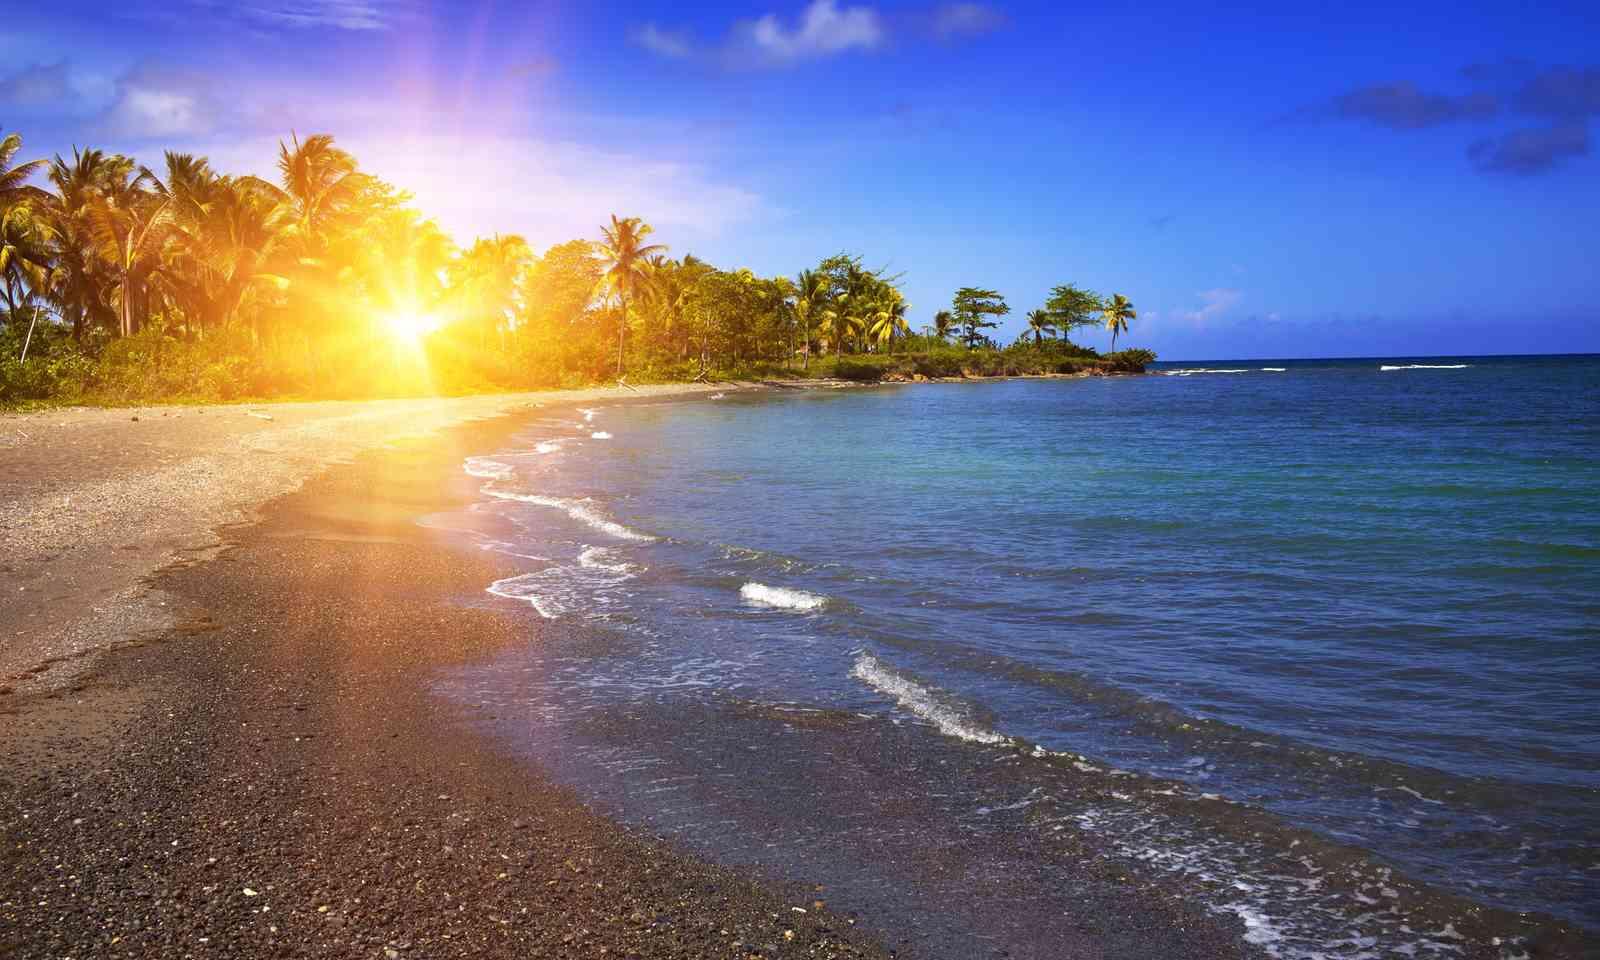 A deserted beach in Jamaica (Dreamstime)